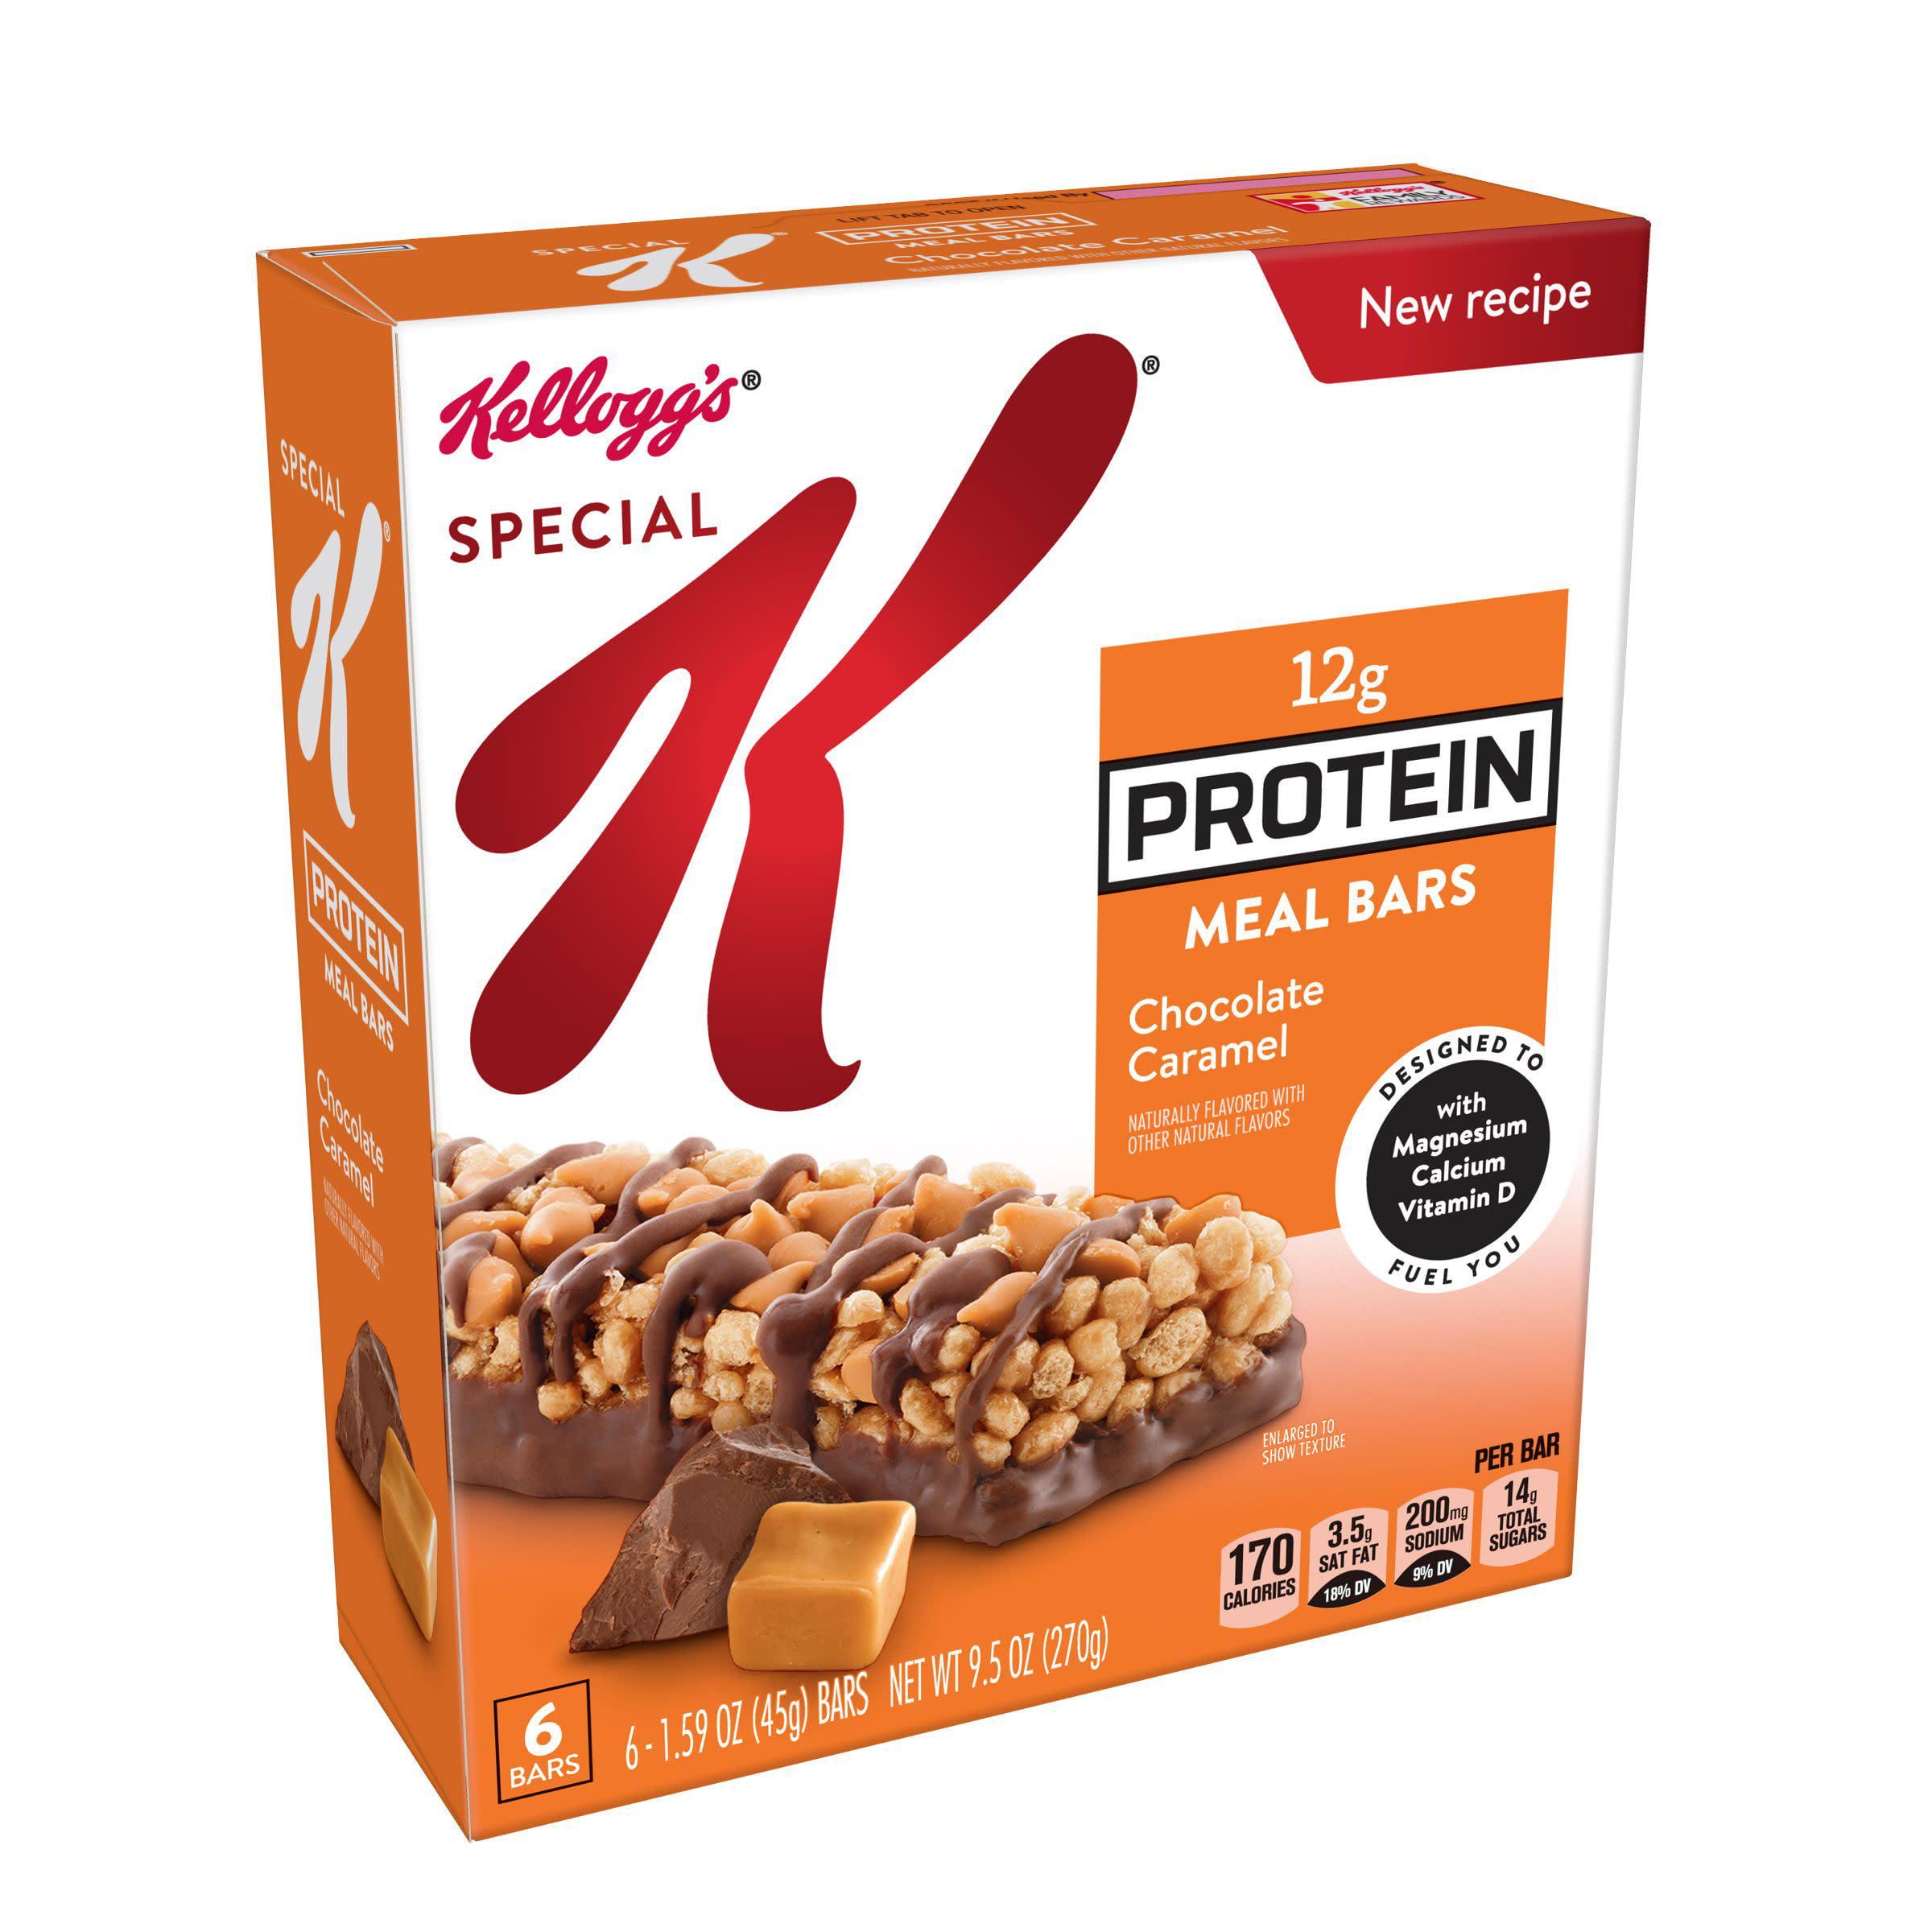 Kellogg's Special K Protein Meal Bar Chocolate Caramel 9.5 oz 6 Ct